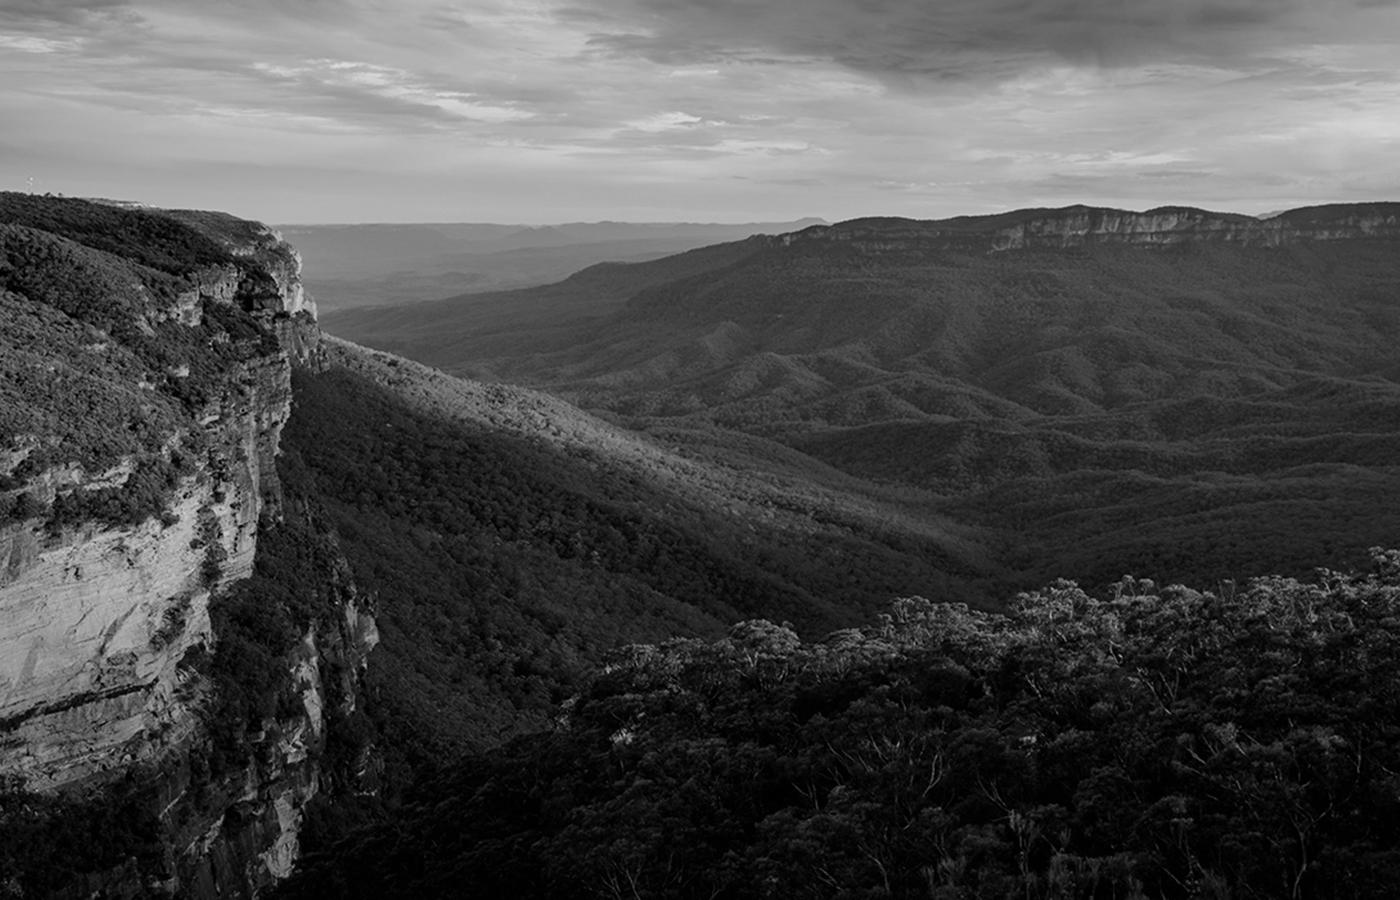 Landscape image of mountainscape